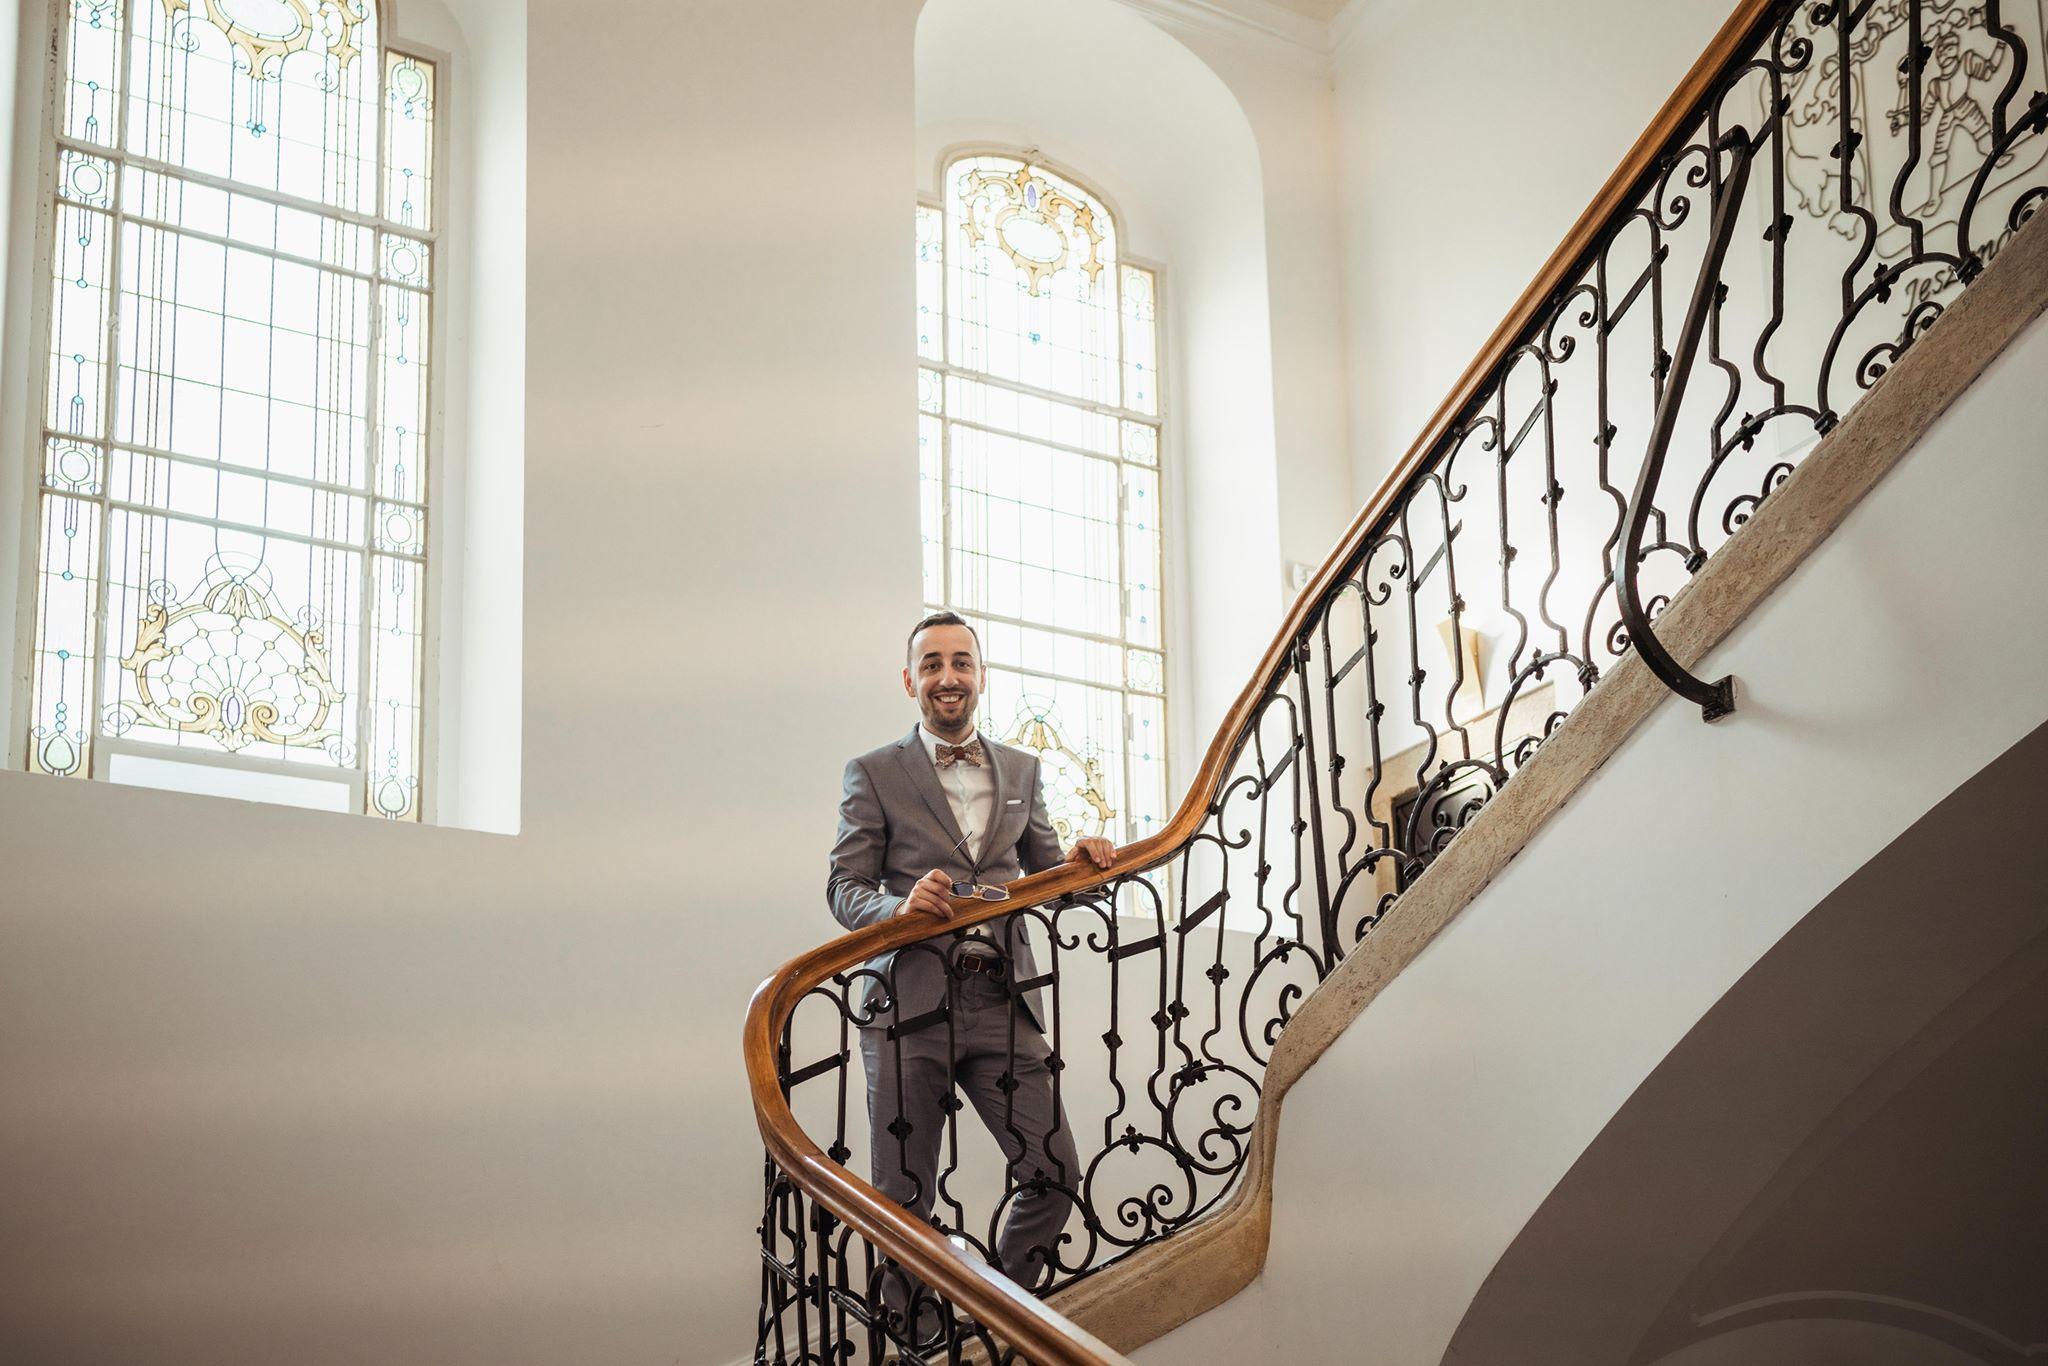 svadba-art-hotel-kastiel-slovakiajpg